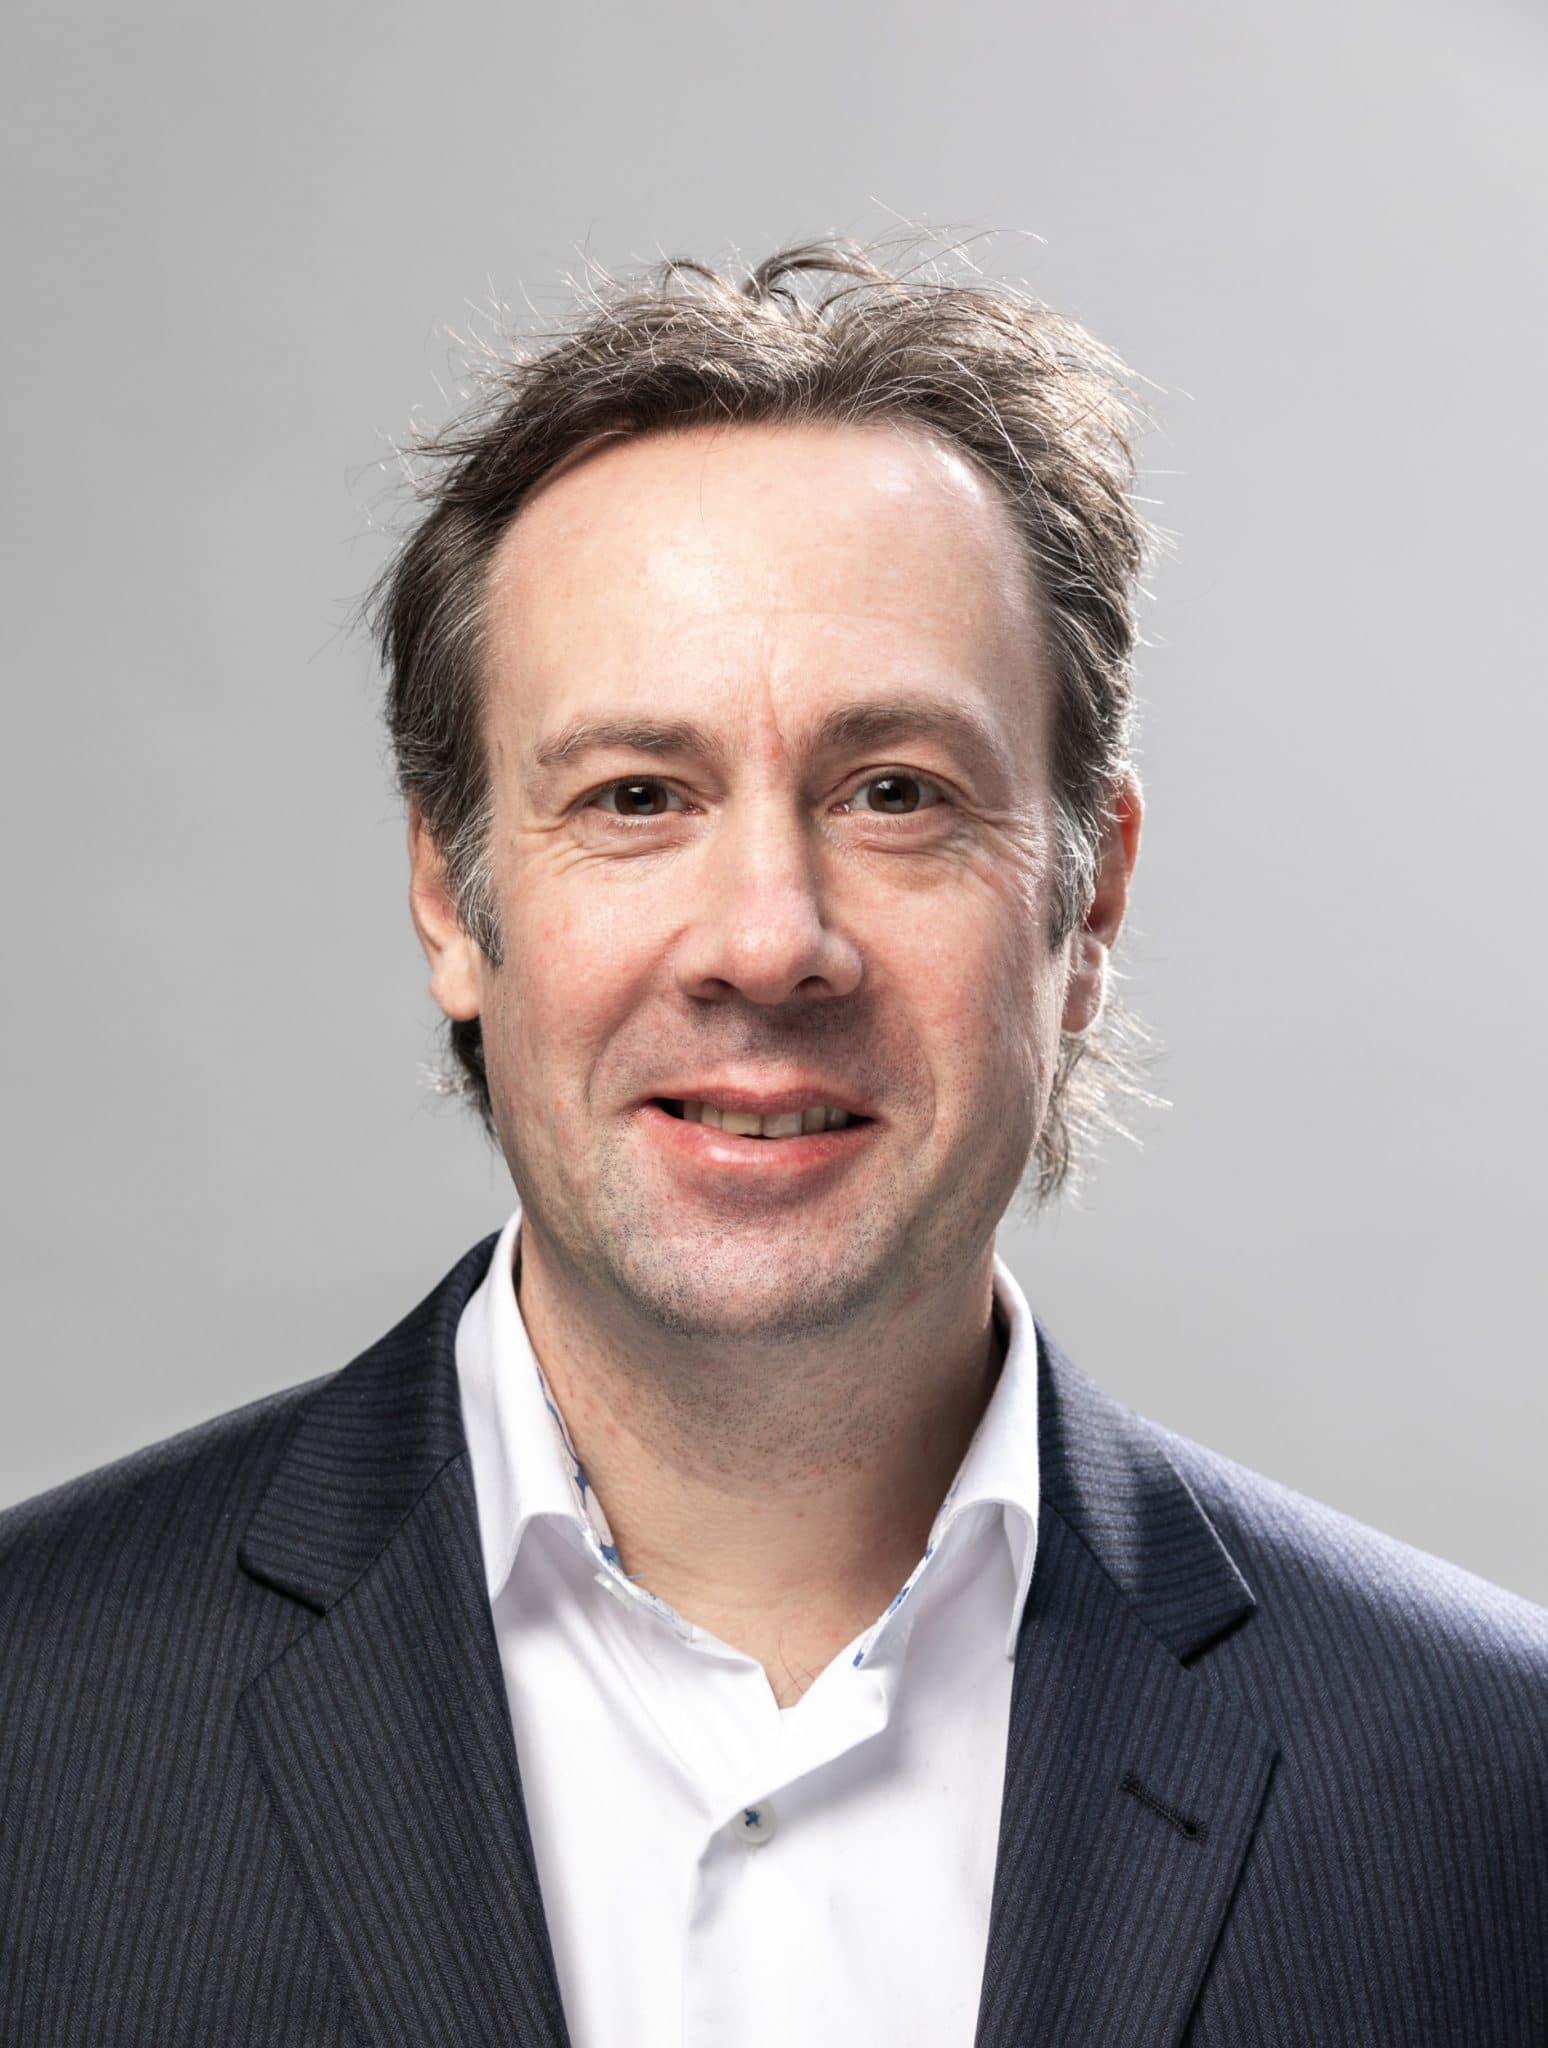 Patrick Loepfe GENTWO